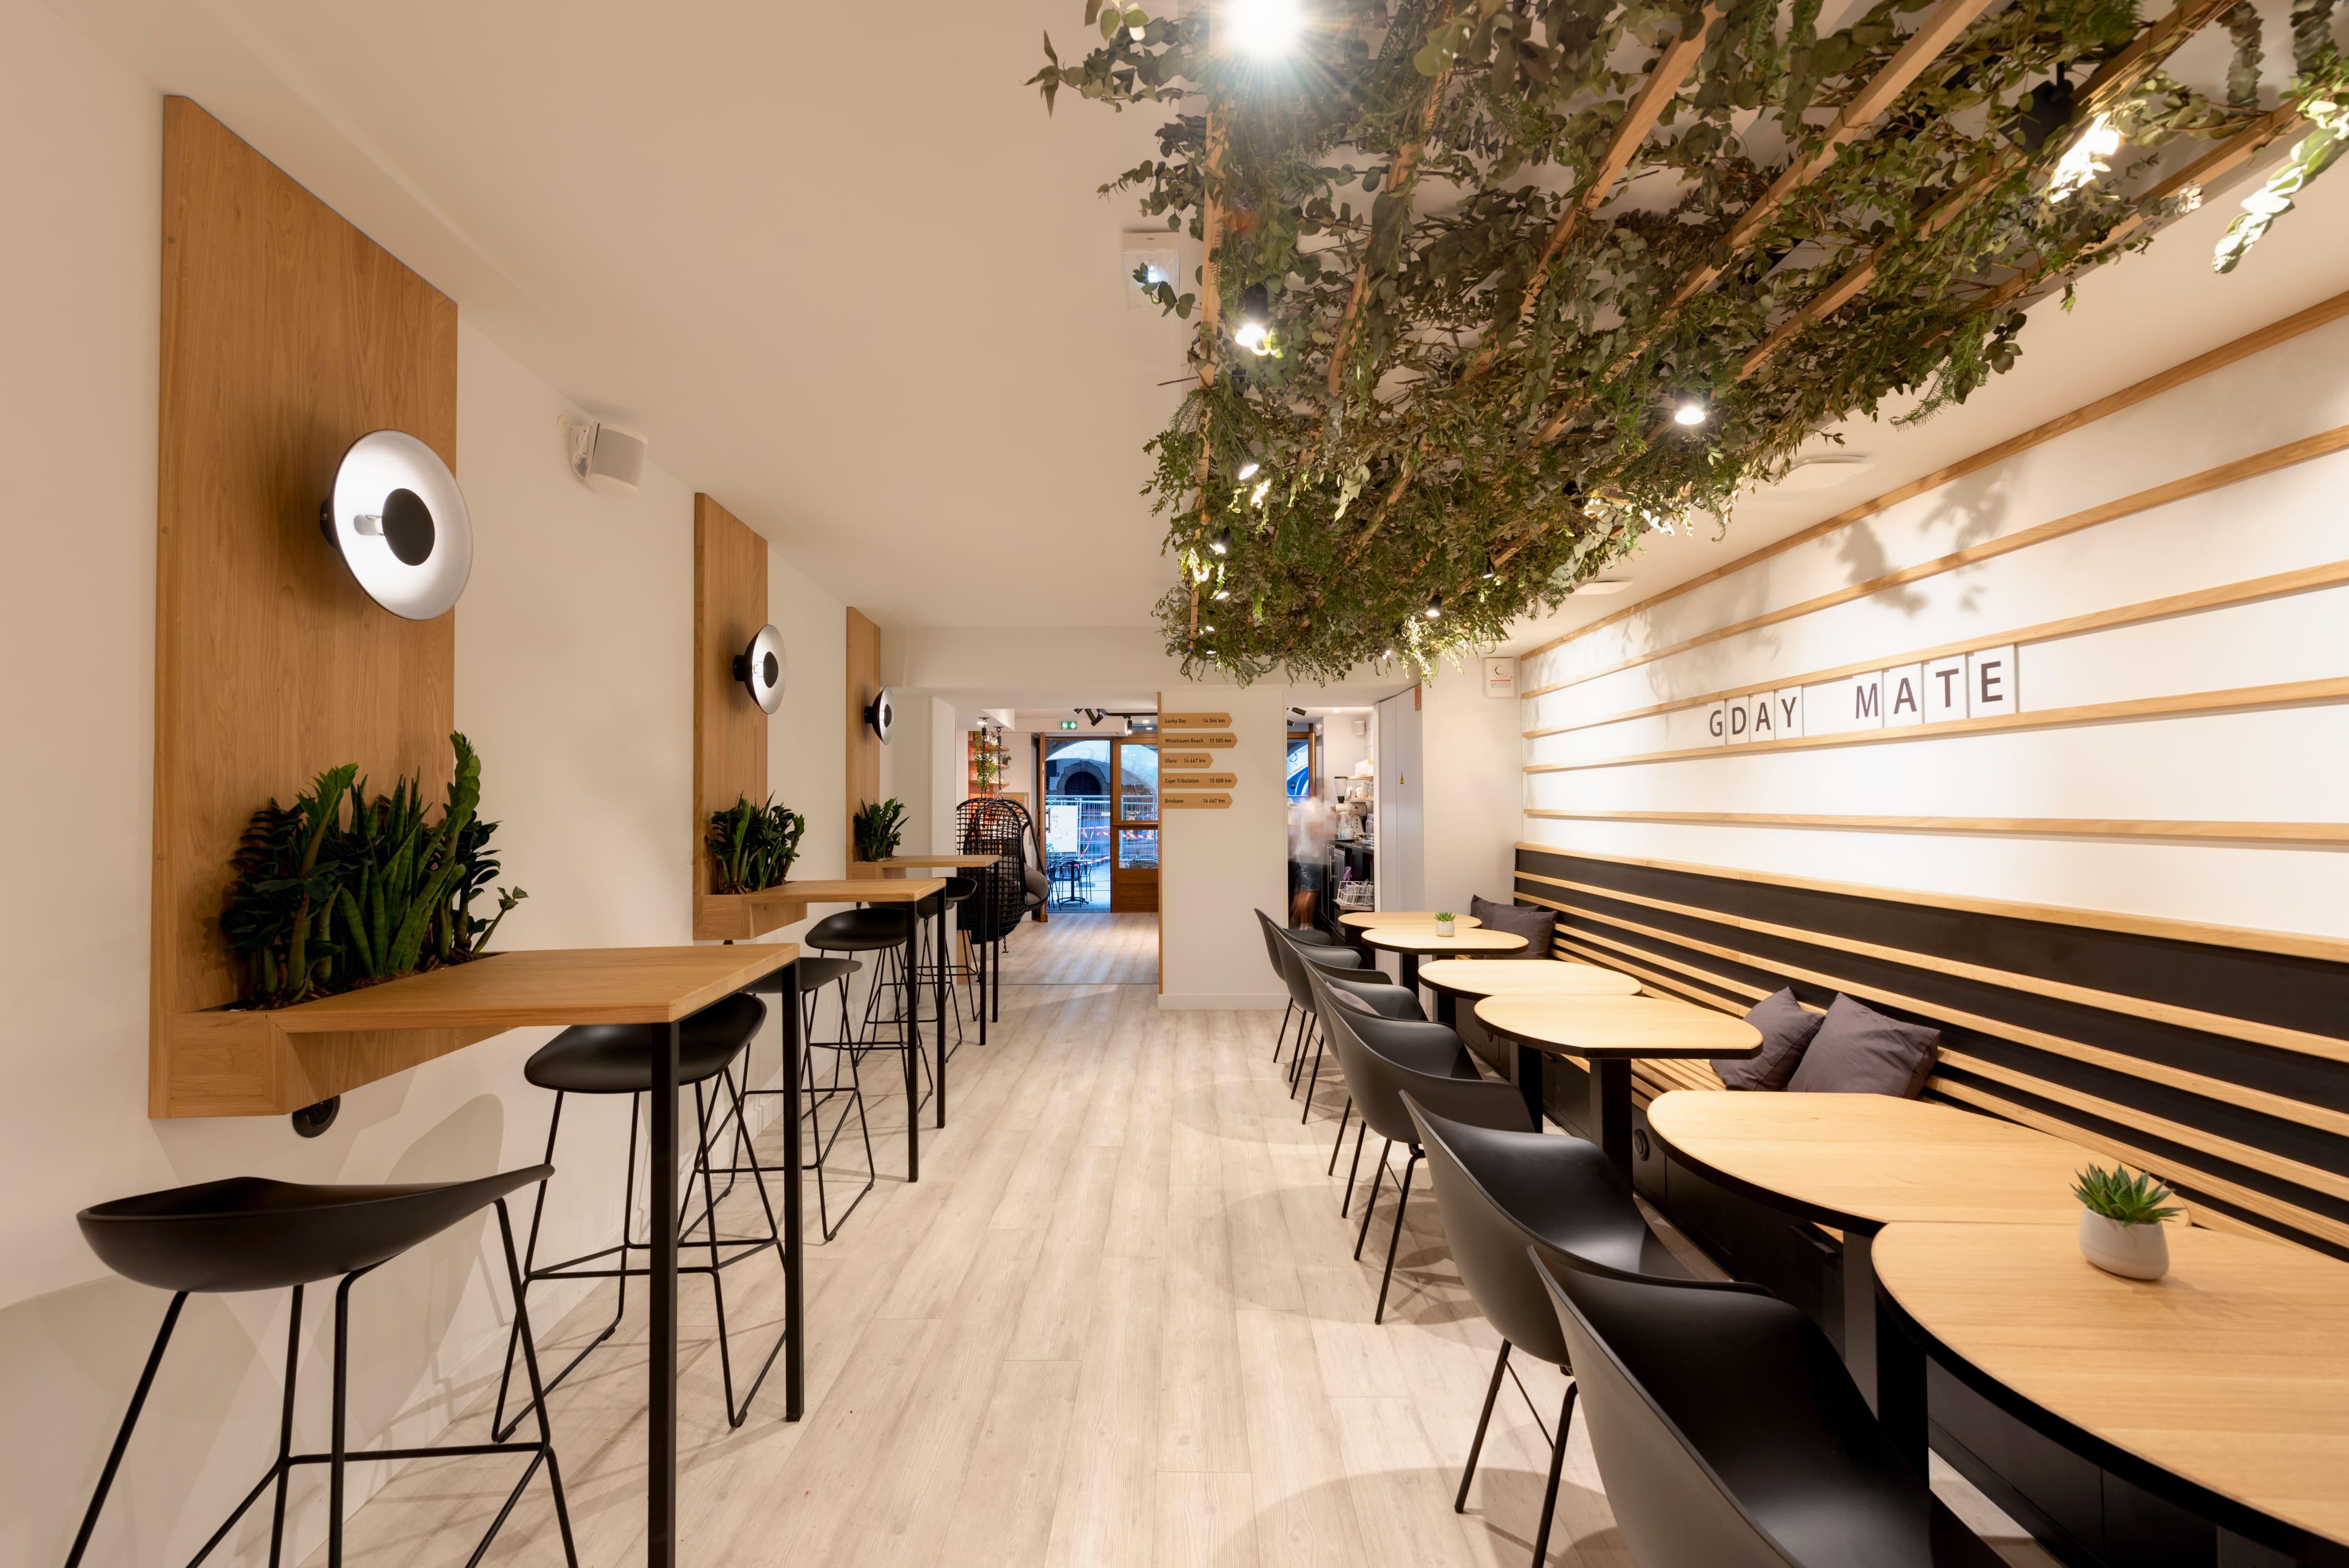 Agencement interieur design métallique ROBI restaurant Haven Annecy 74 agencement en metal 4